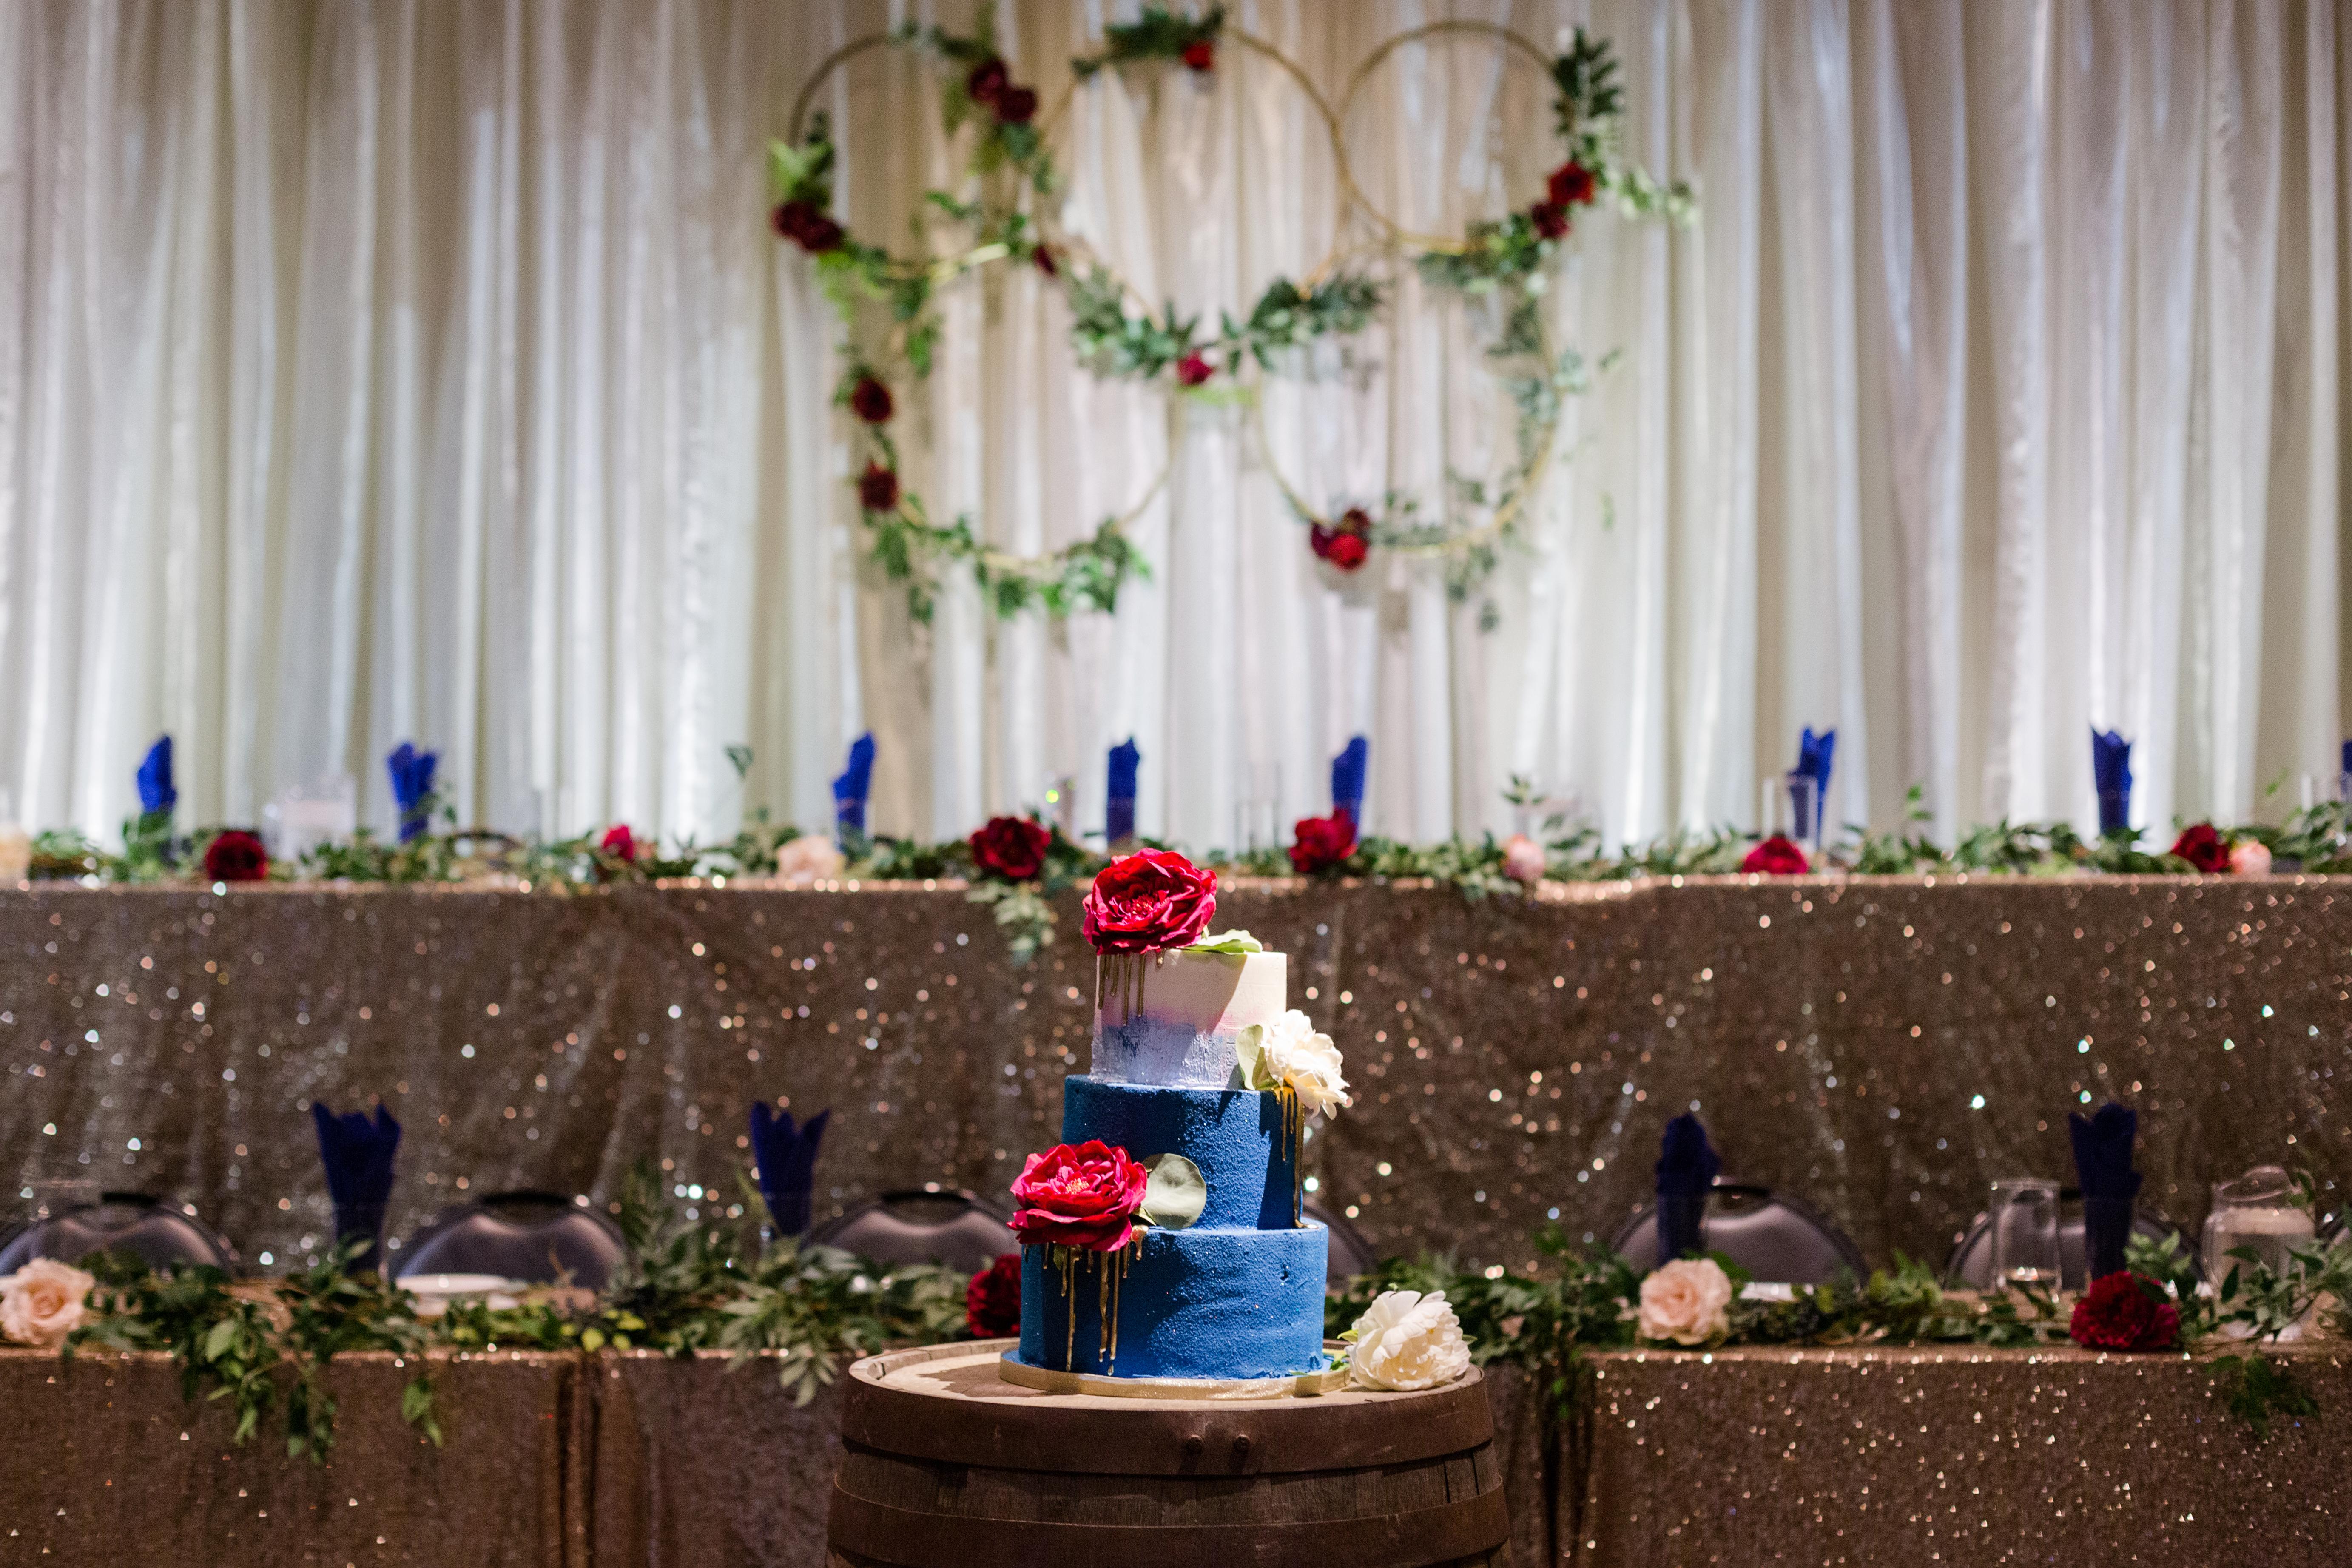 Kunkleman Wedding - Reception - Captured